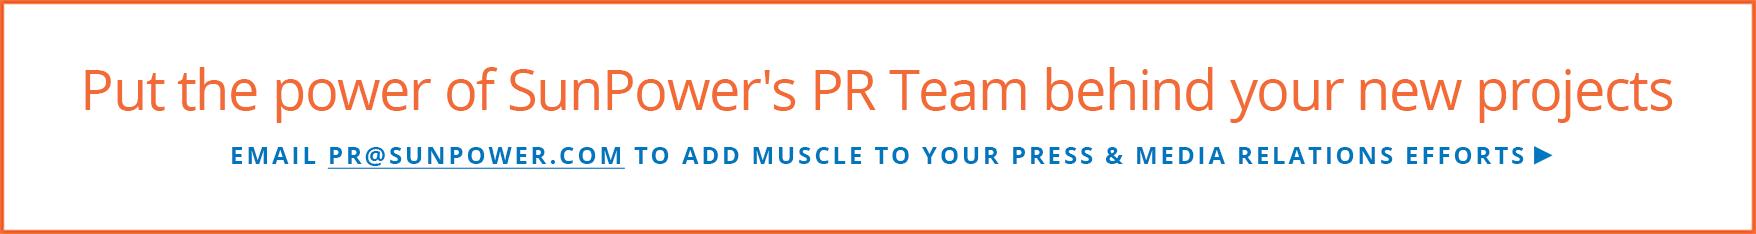 Email PR@sunpower.com banner ad